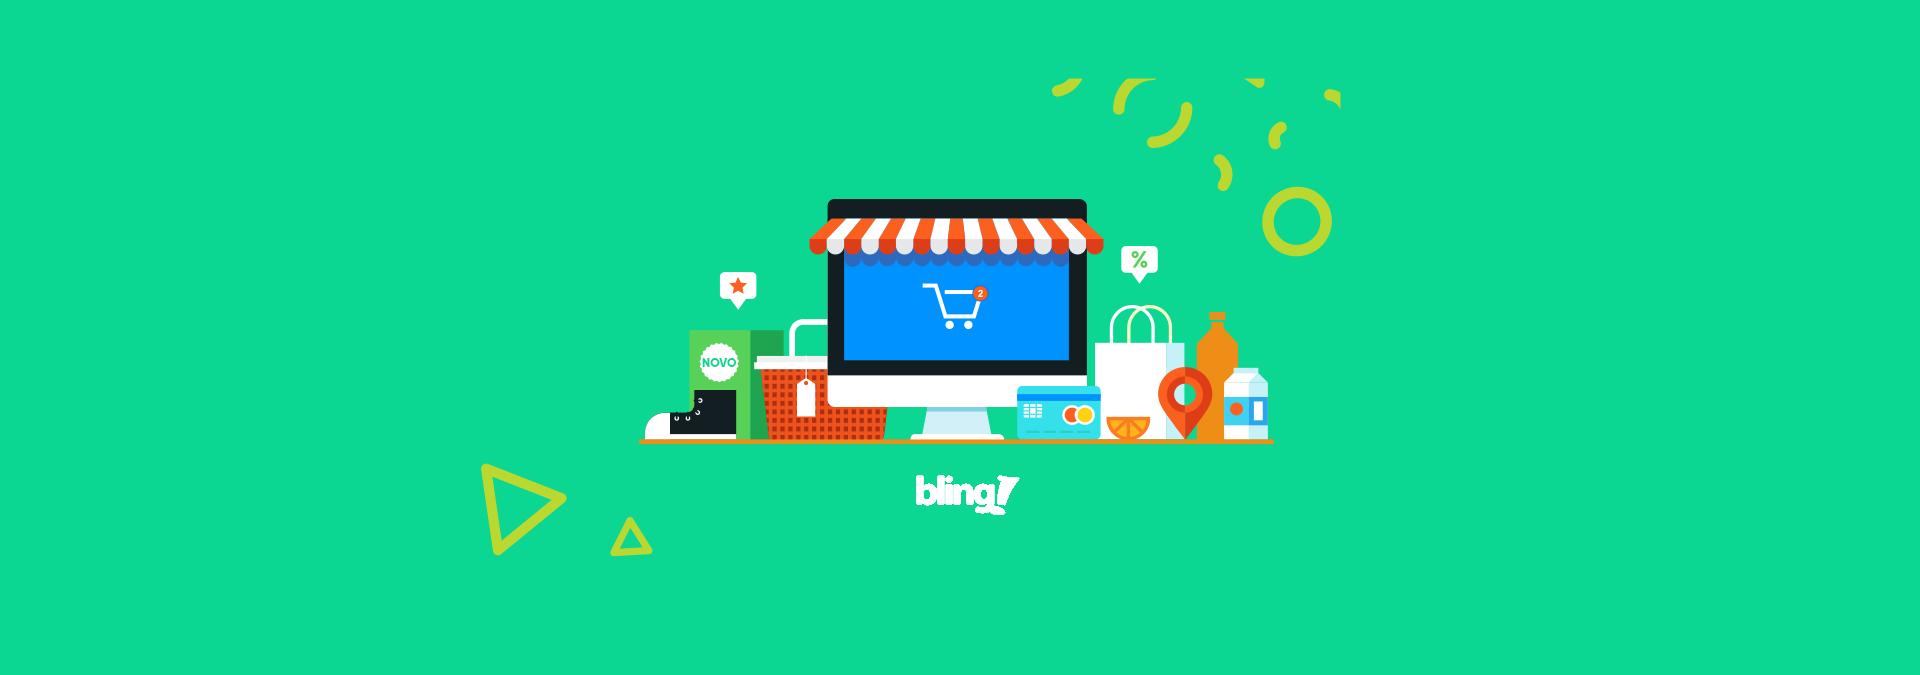 Da loja virtual ao Marketplace: Descubra como montar bons anúncios para vender online